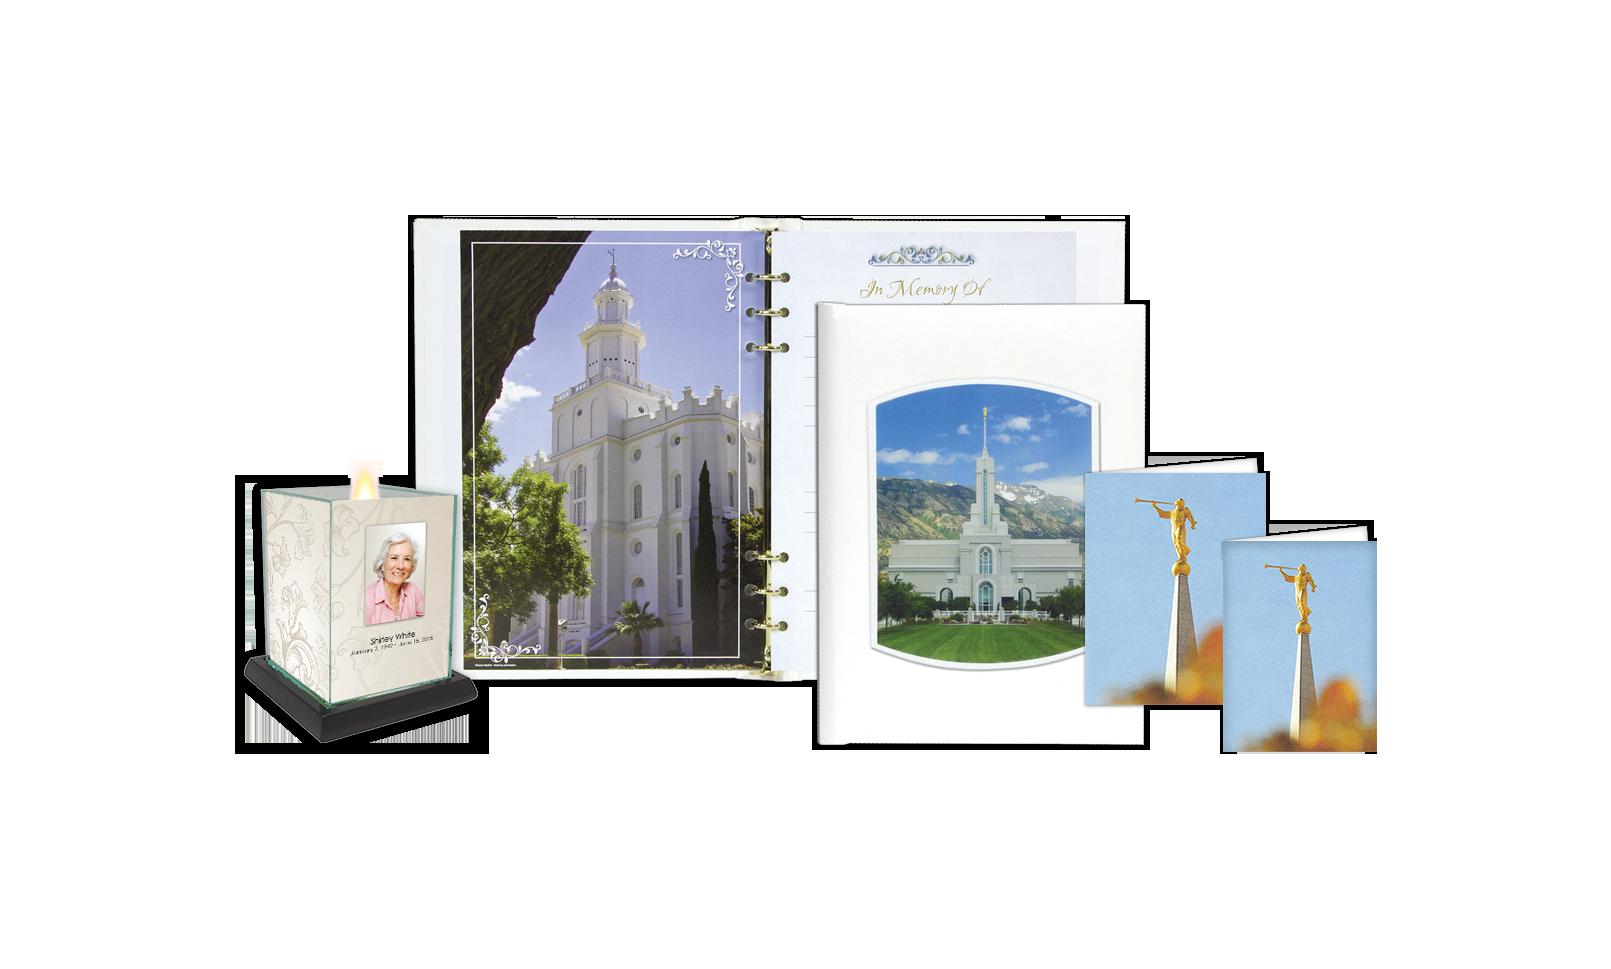 ROL Latter Day Saints Mt. Timpanogos Temple Series 341 LDS